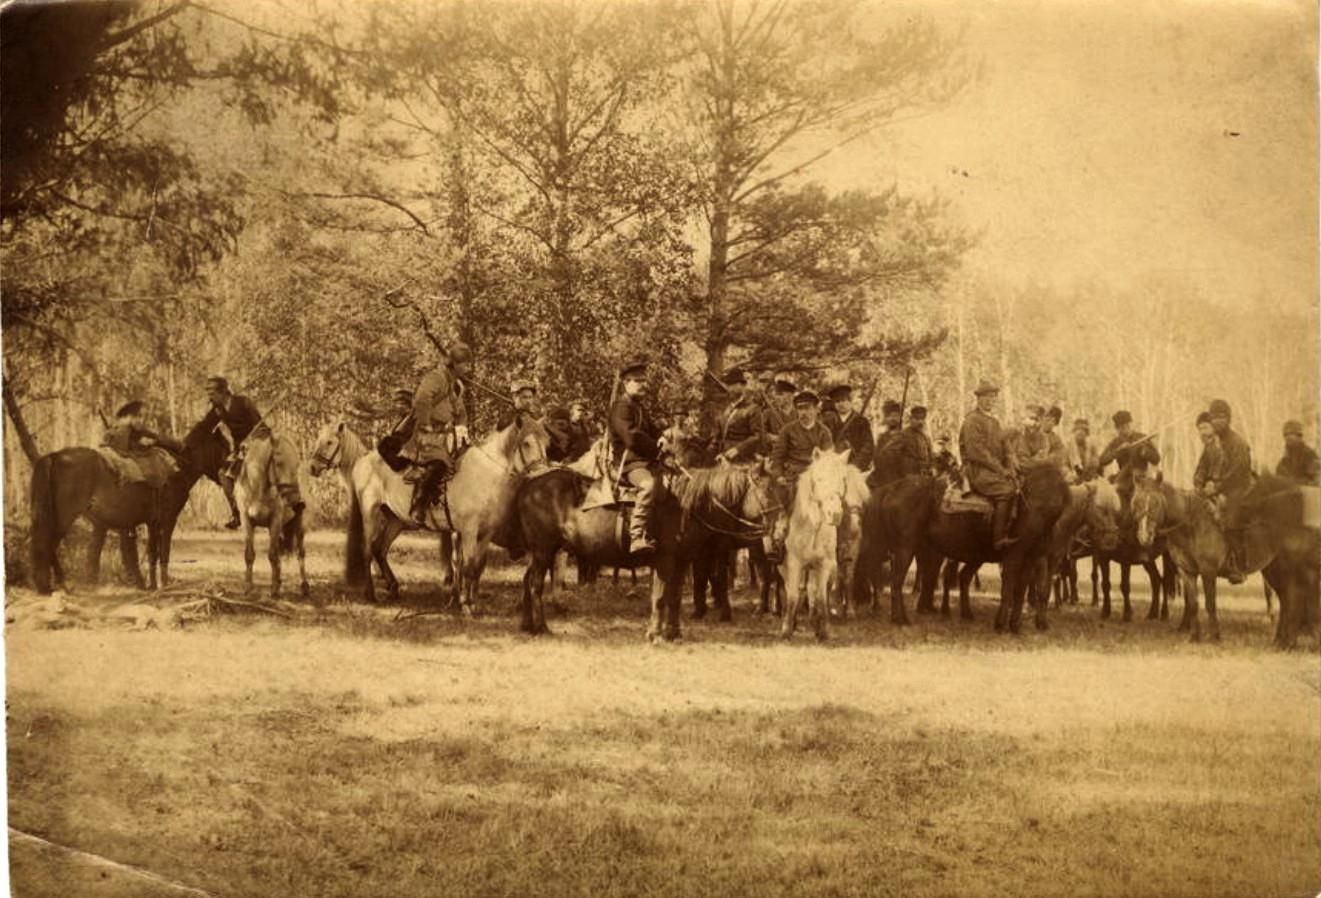 Группа охотников на лошадях. 1910-е